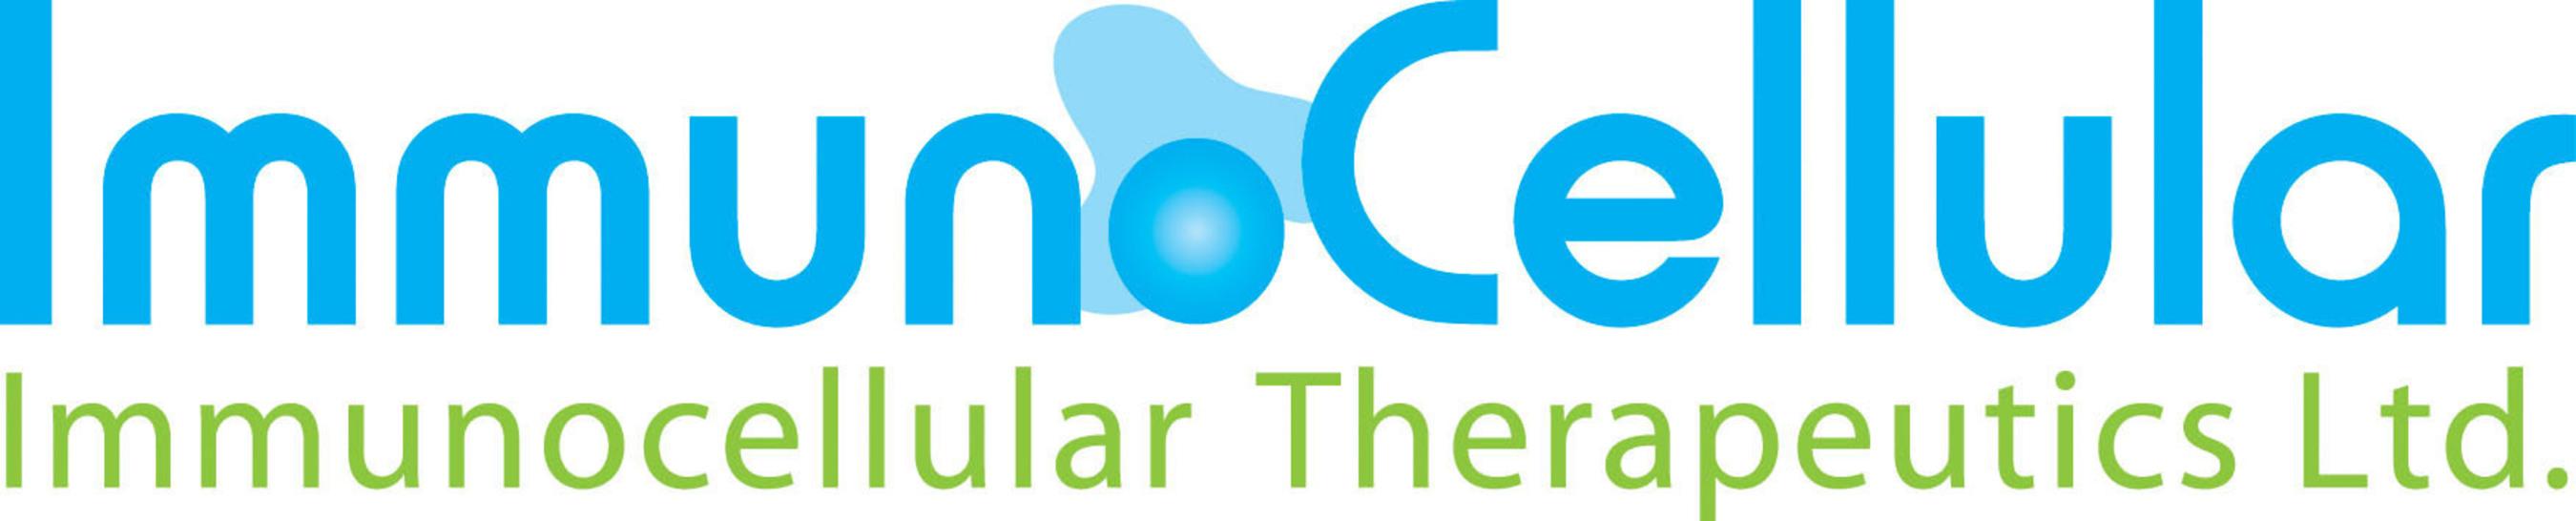 ImmunoCellular Therapeutics Logo. (PRNewsFoto/ImmunoCellular Therapeutics) (PRNewsFoto/IMMUNOCELLULAR THERAPEUTICS)